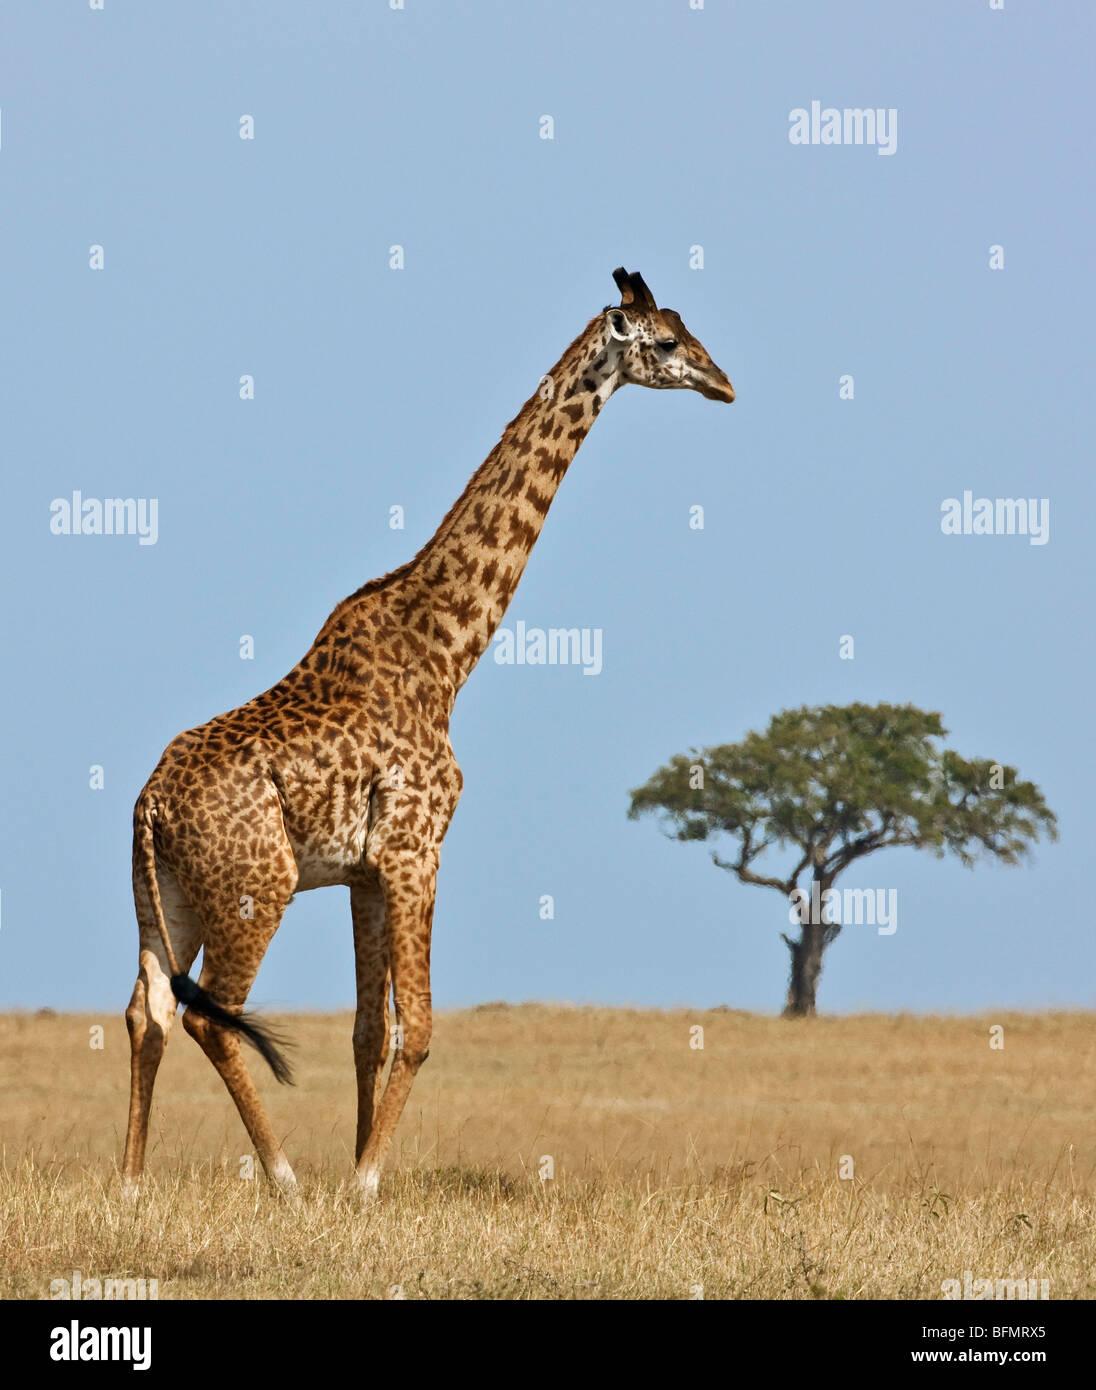 Kenya. A Masai giraffe crosses the vast grass plains in Masai Mara National Reserve. - Stock Image